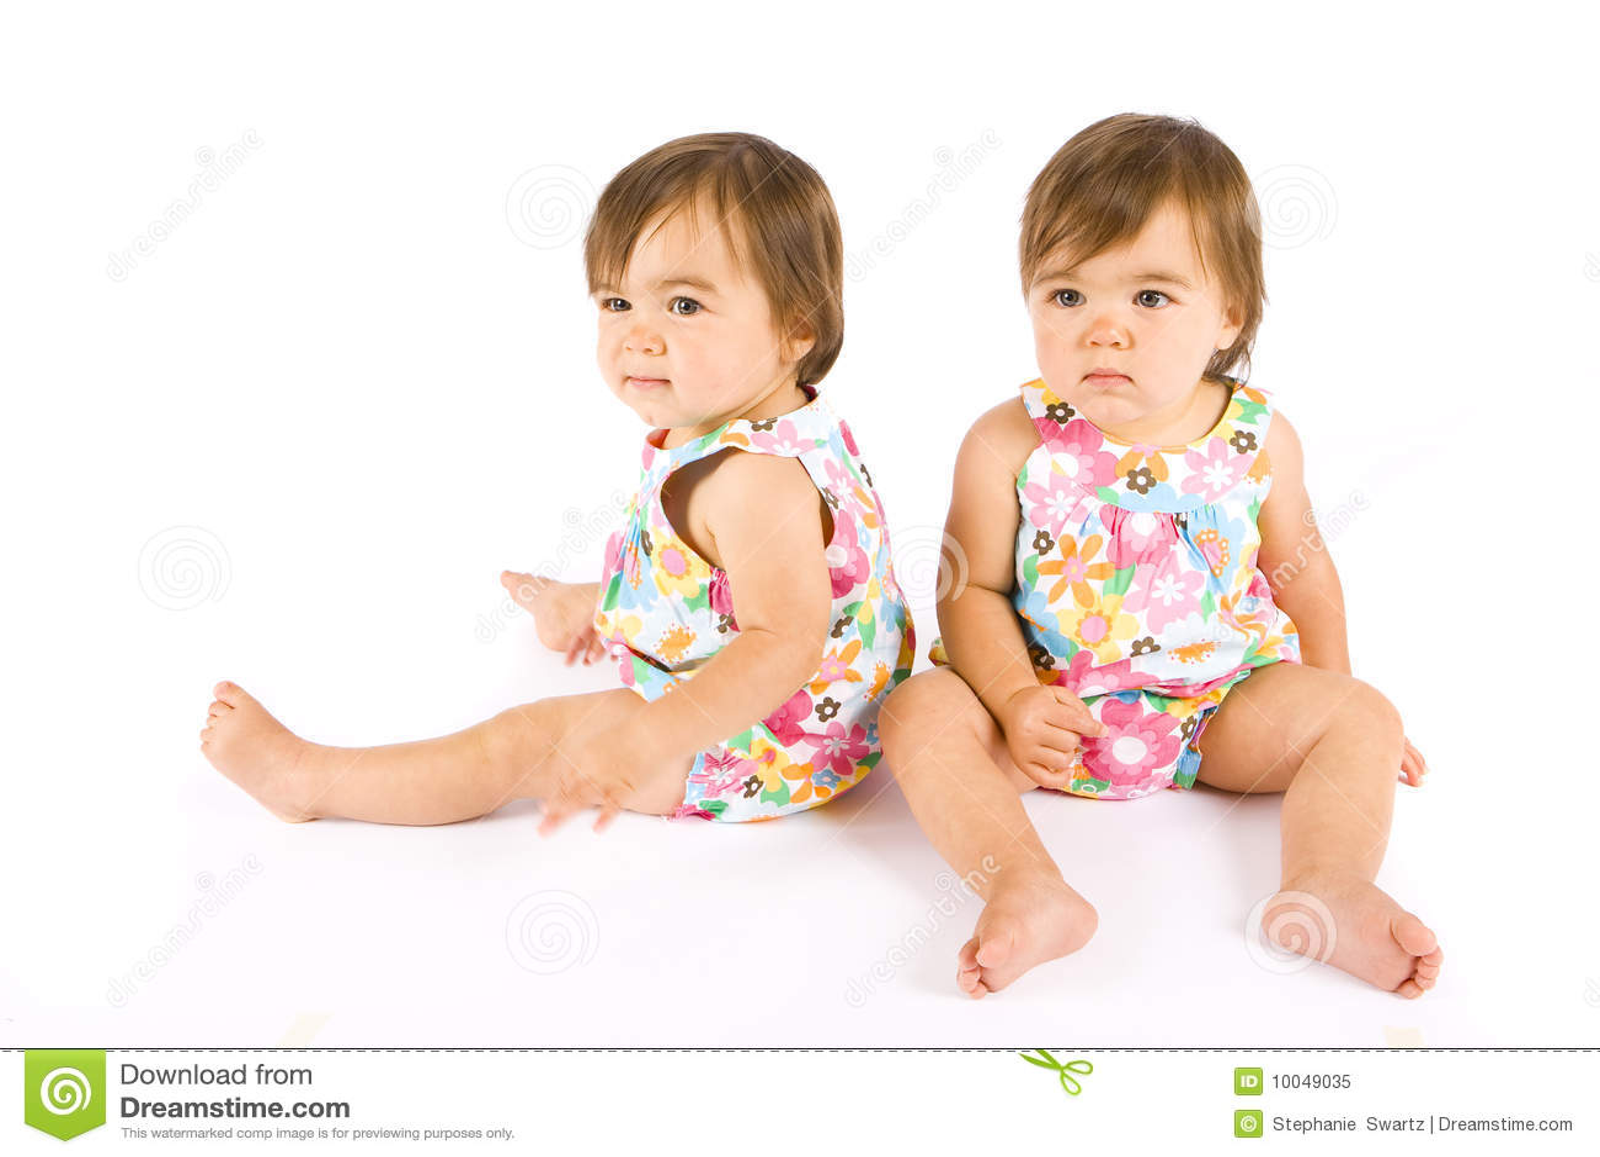 Doppelschätzchen